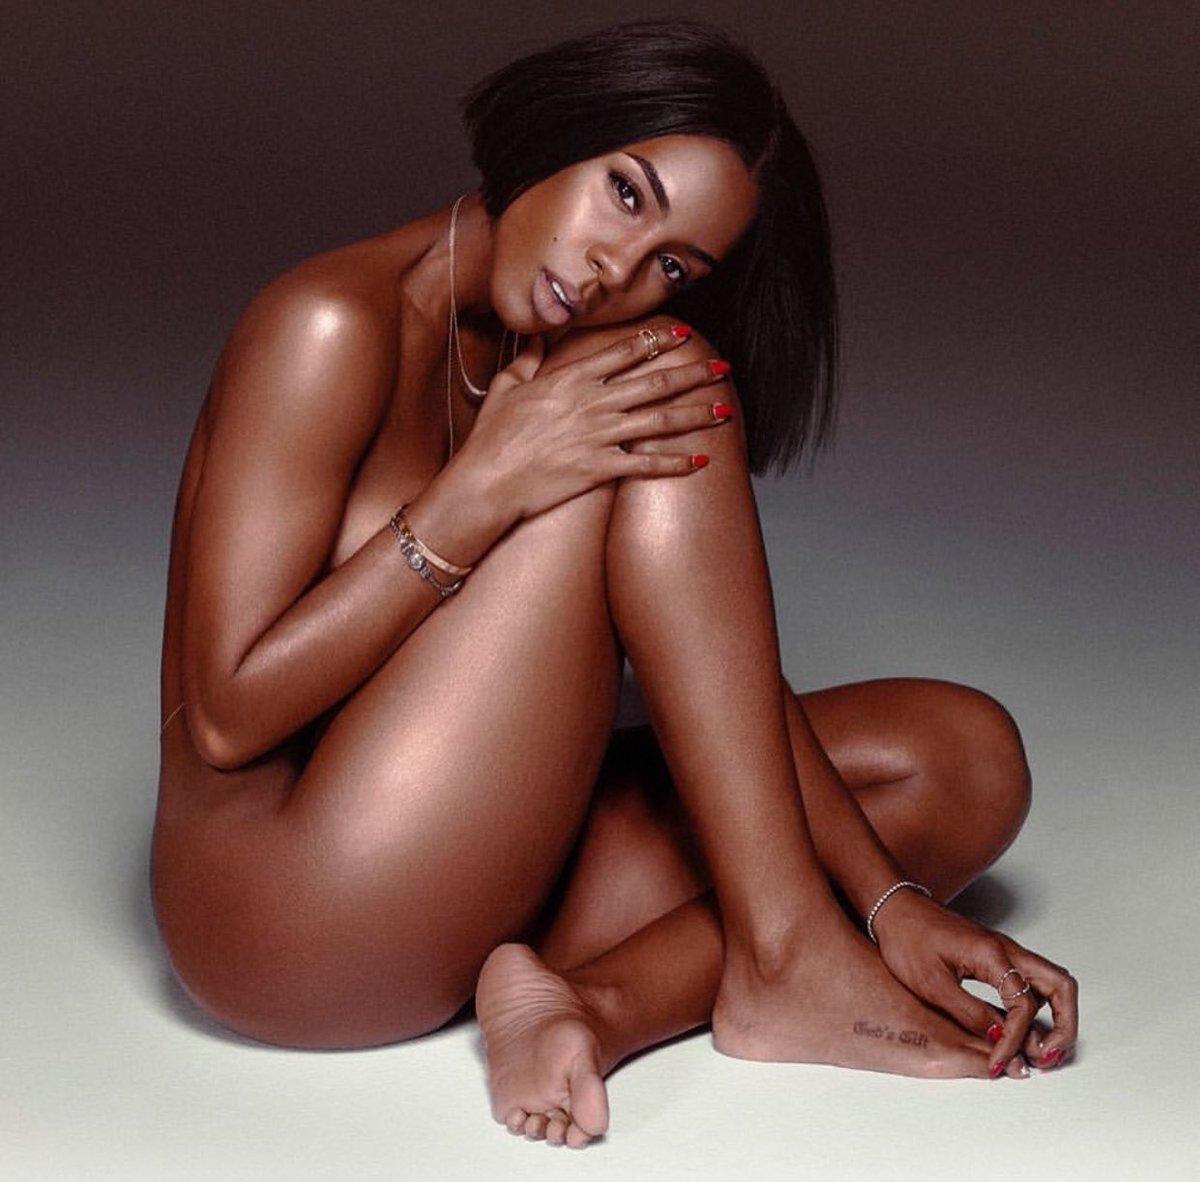 Angela Simmons Nude Pics kelly rowland nude photos leaked online - black celebs leaked